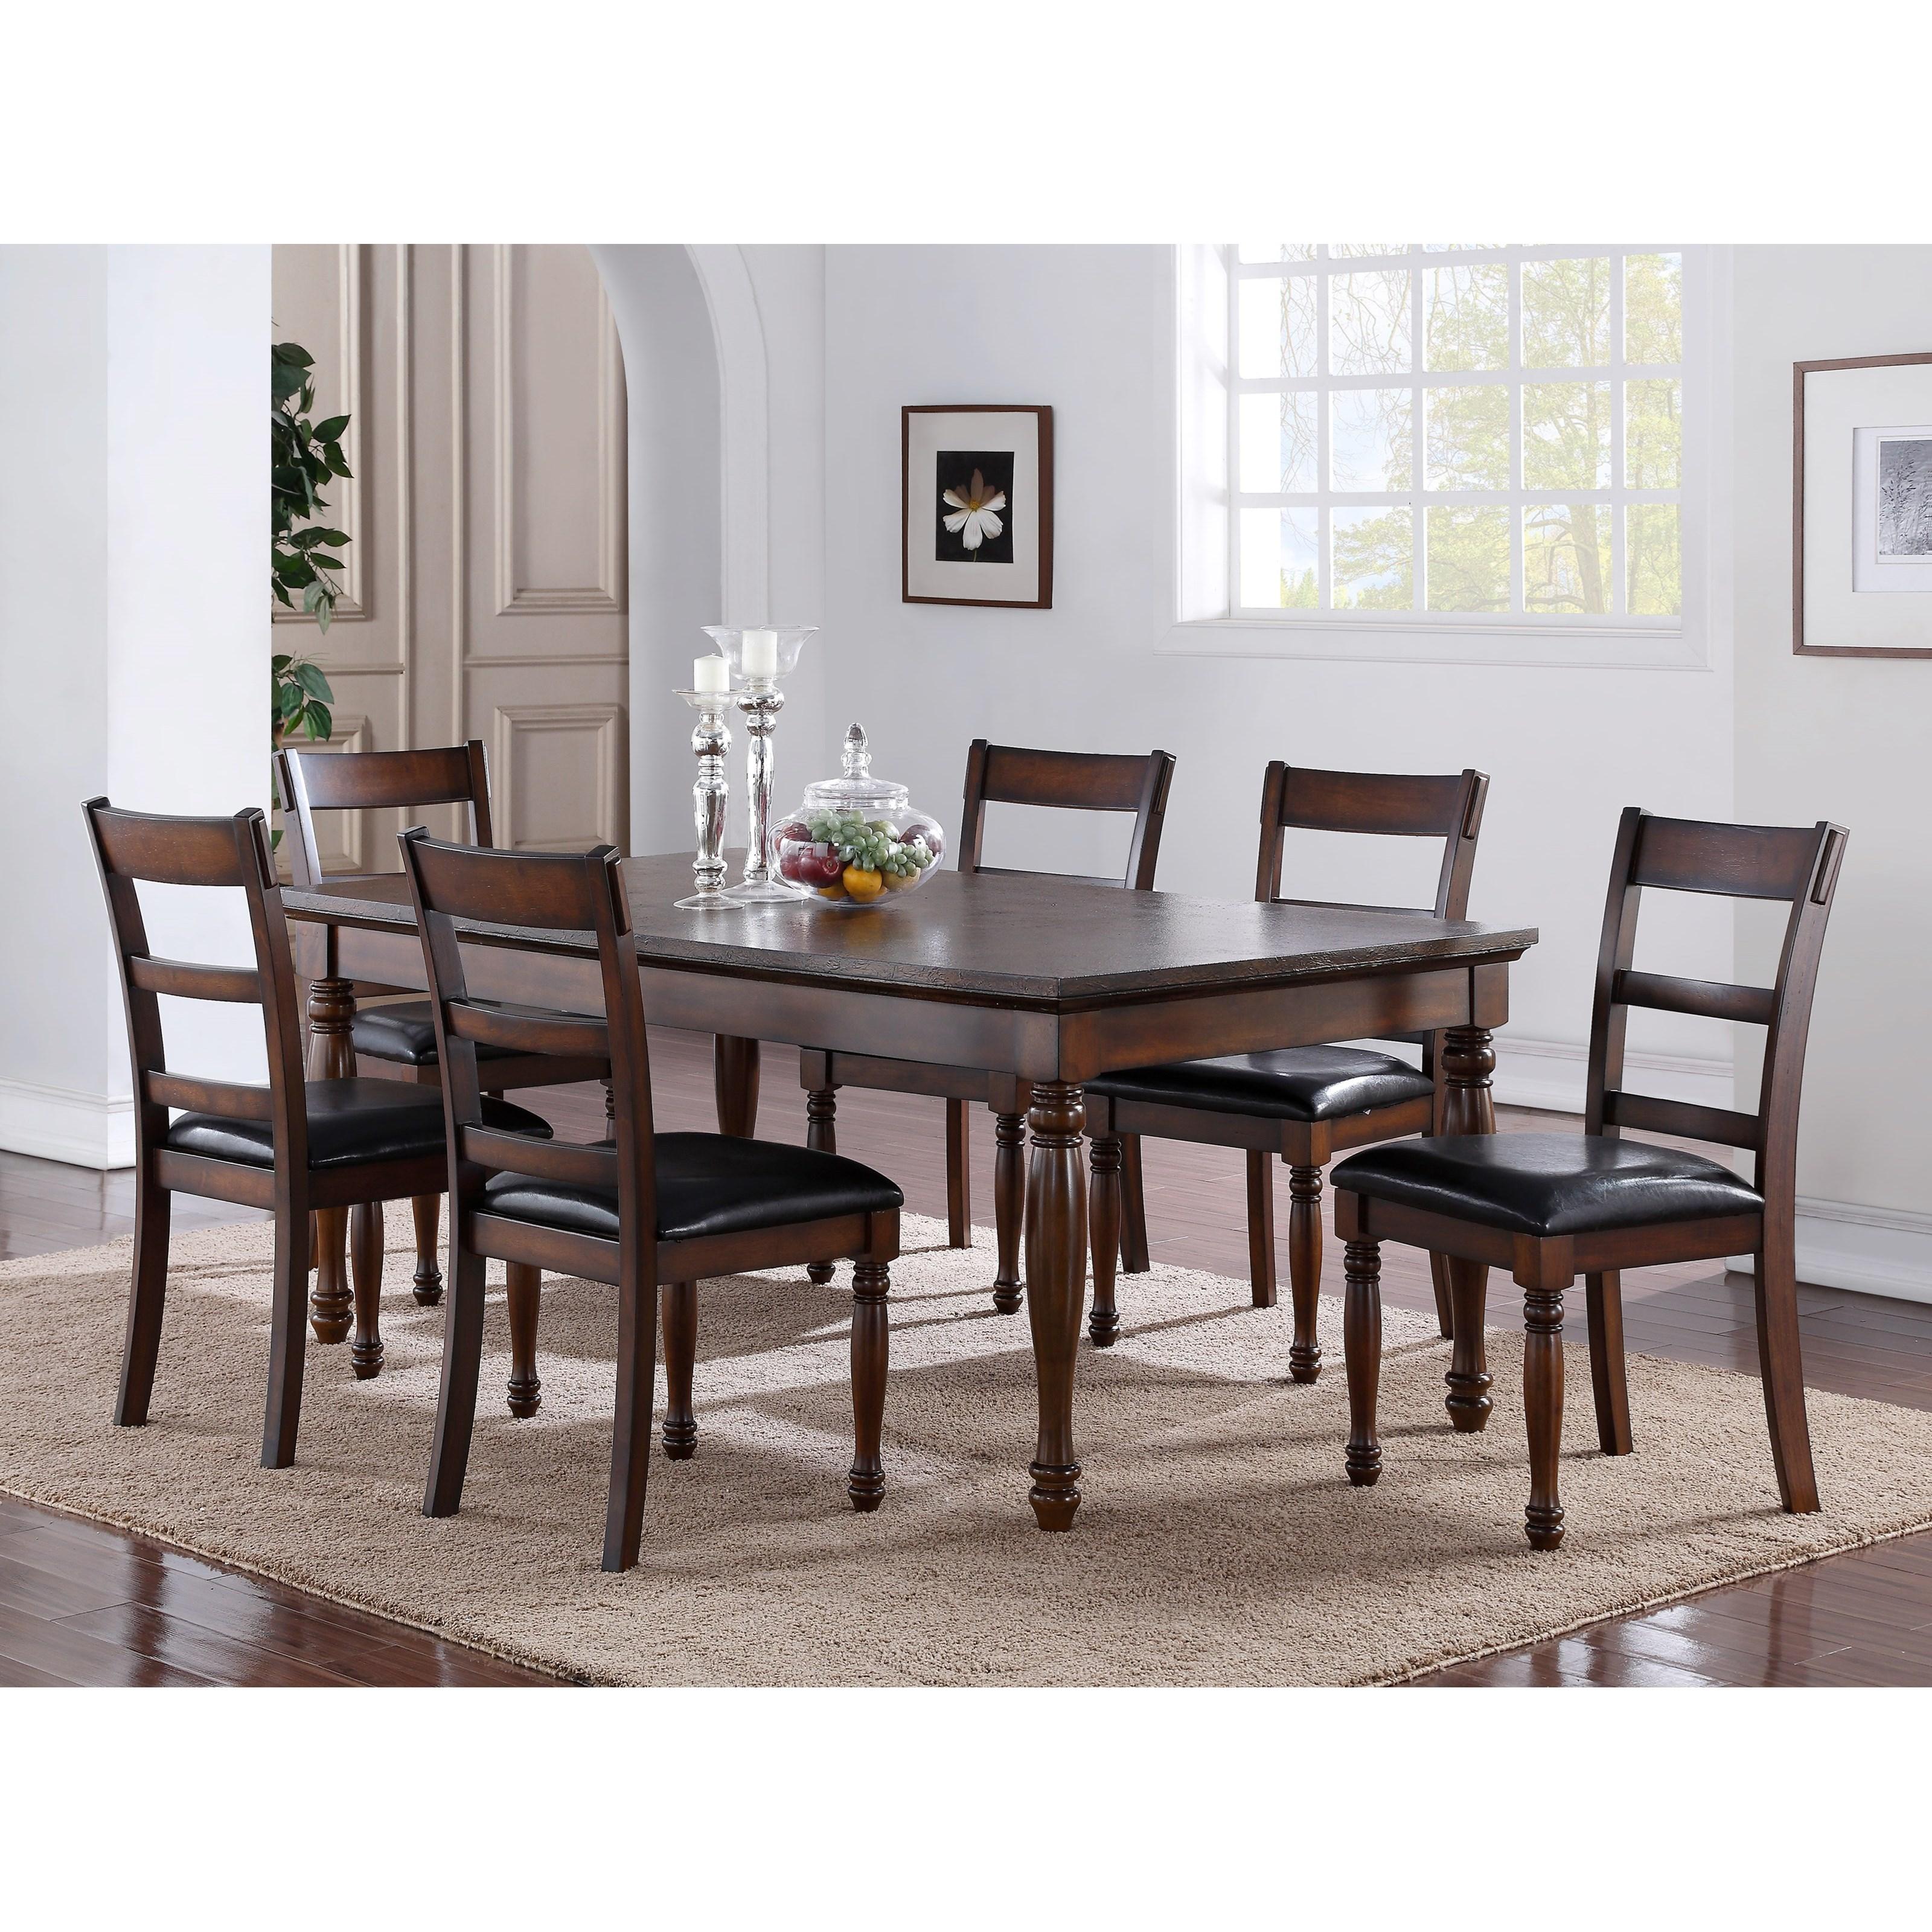 Legends Furniture Breckenridge 7 Piece Table U0026 Chair Set